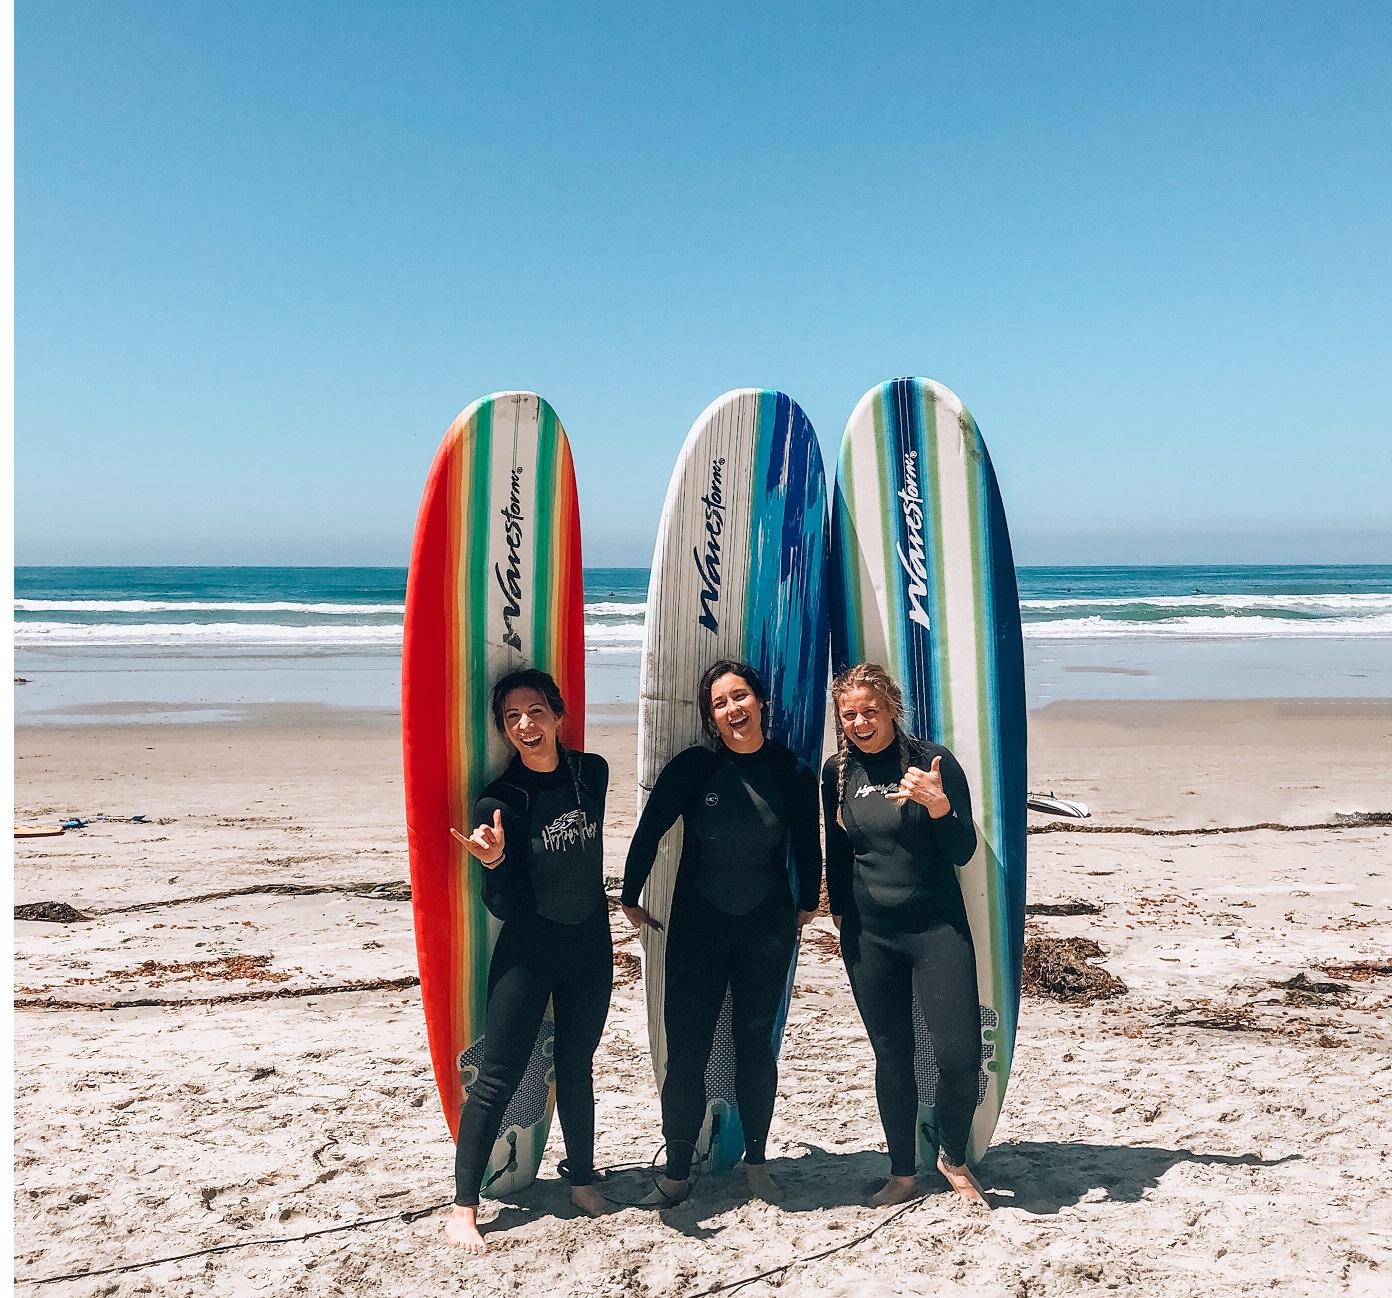 5 Life Hacks For Beach Bums